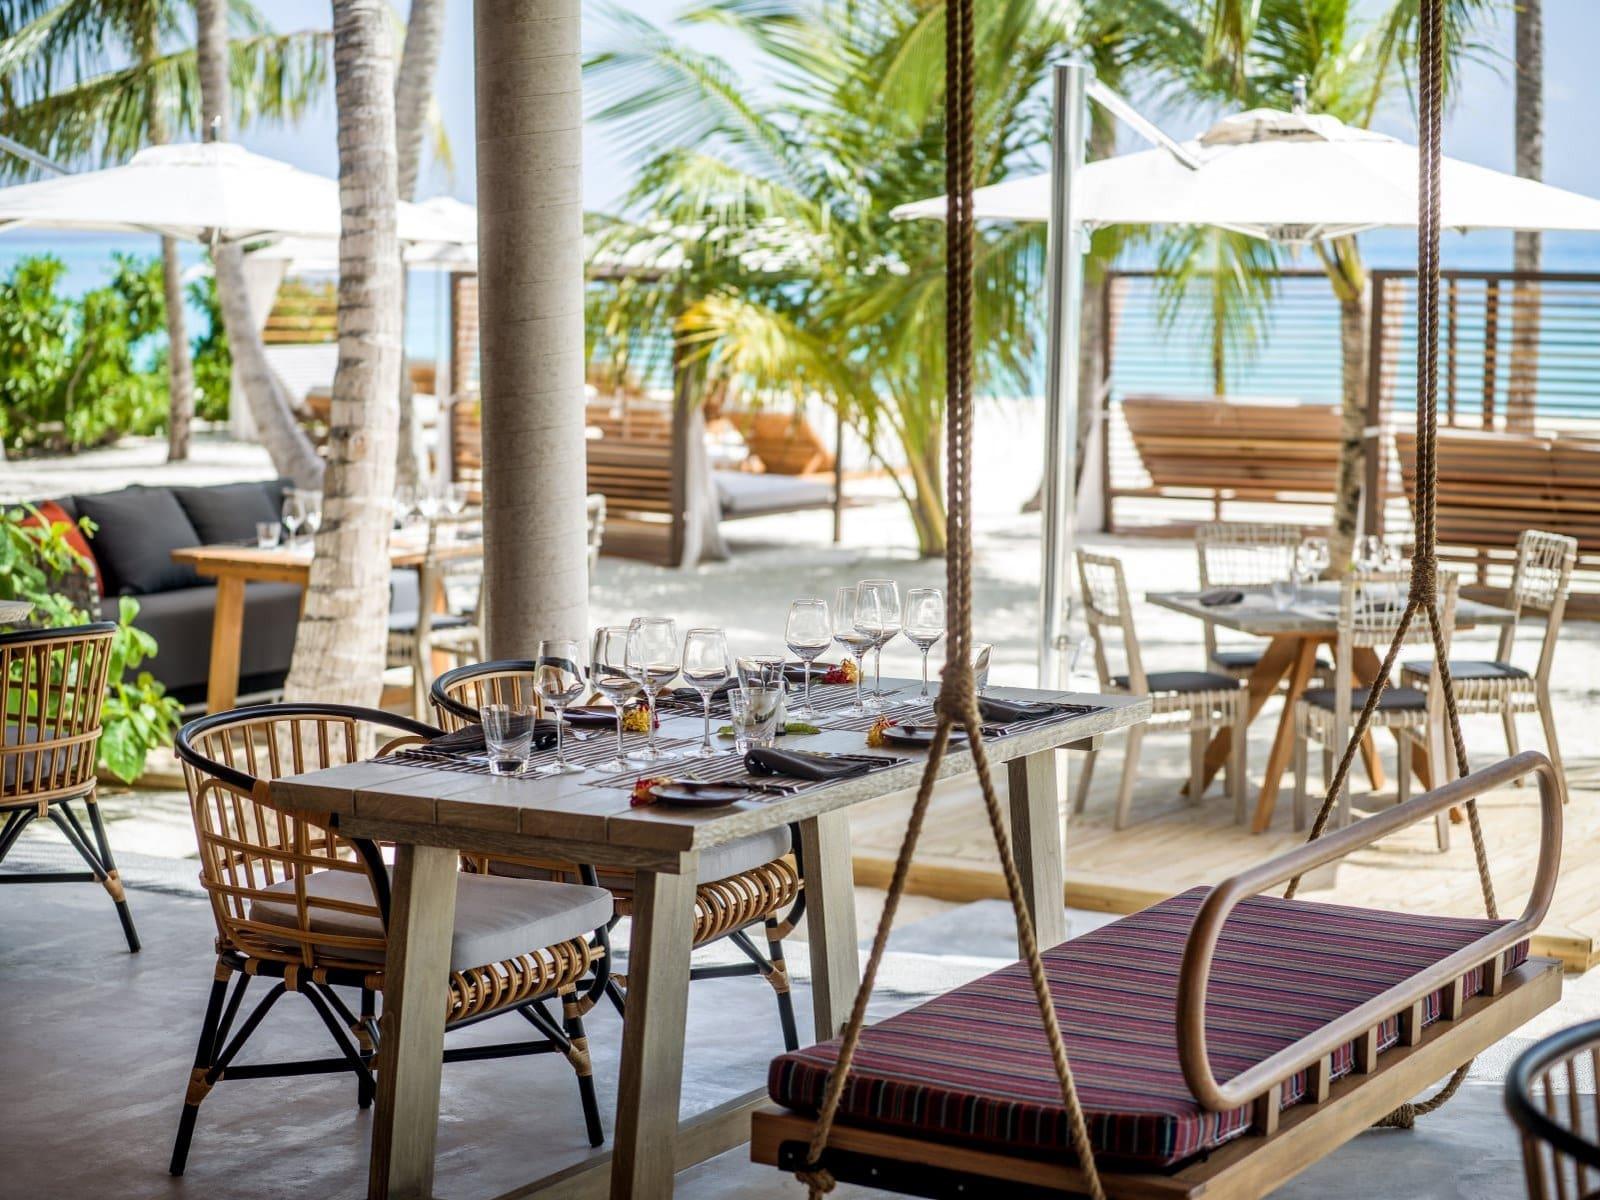 Мальдивы, отель Intercontinental Maldives Maamunagau, кафе Umi